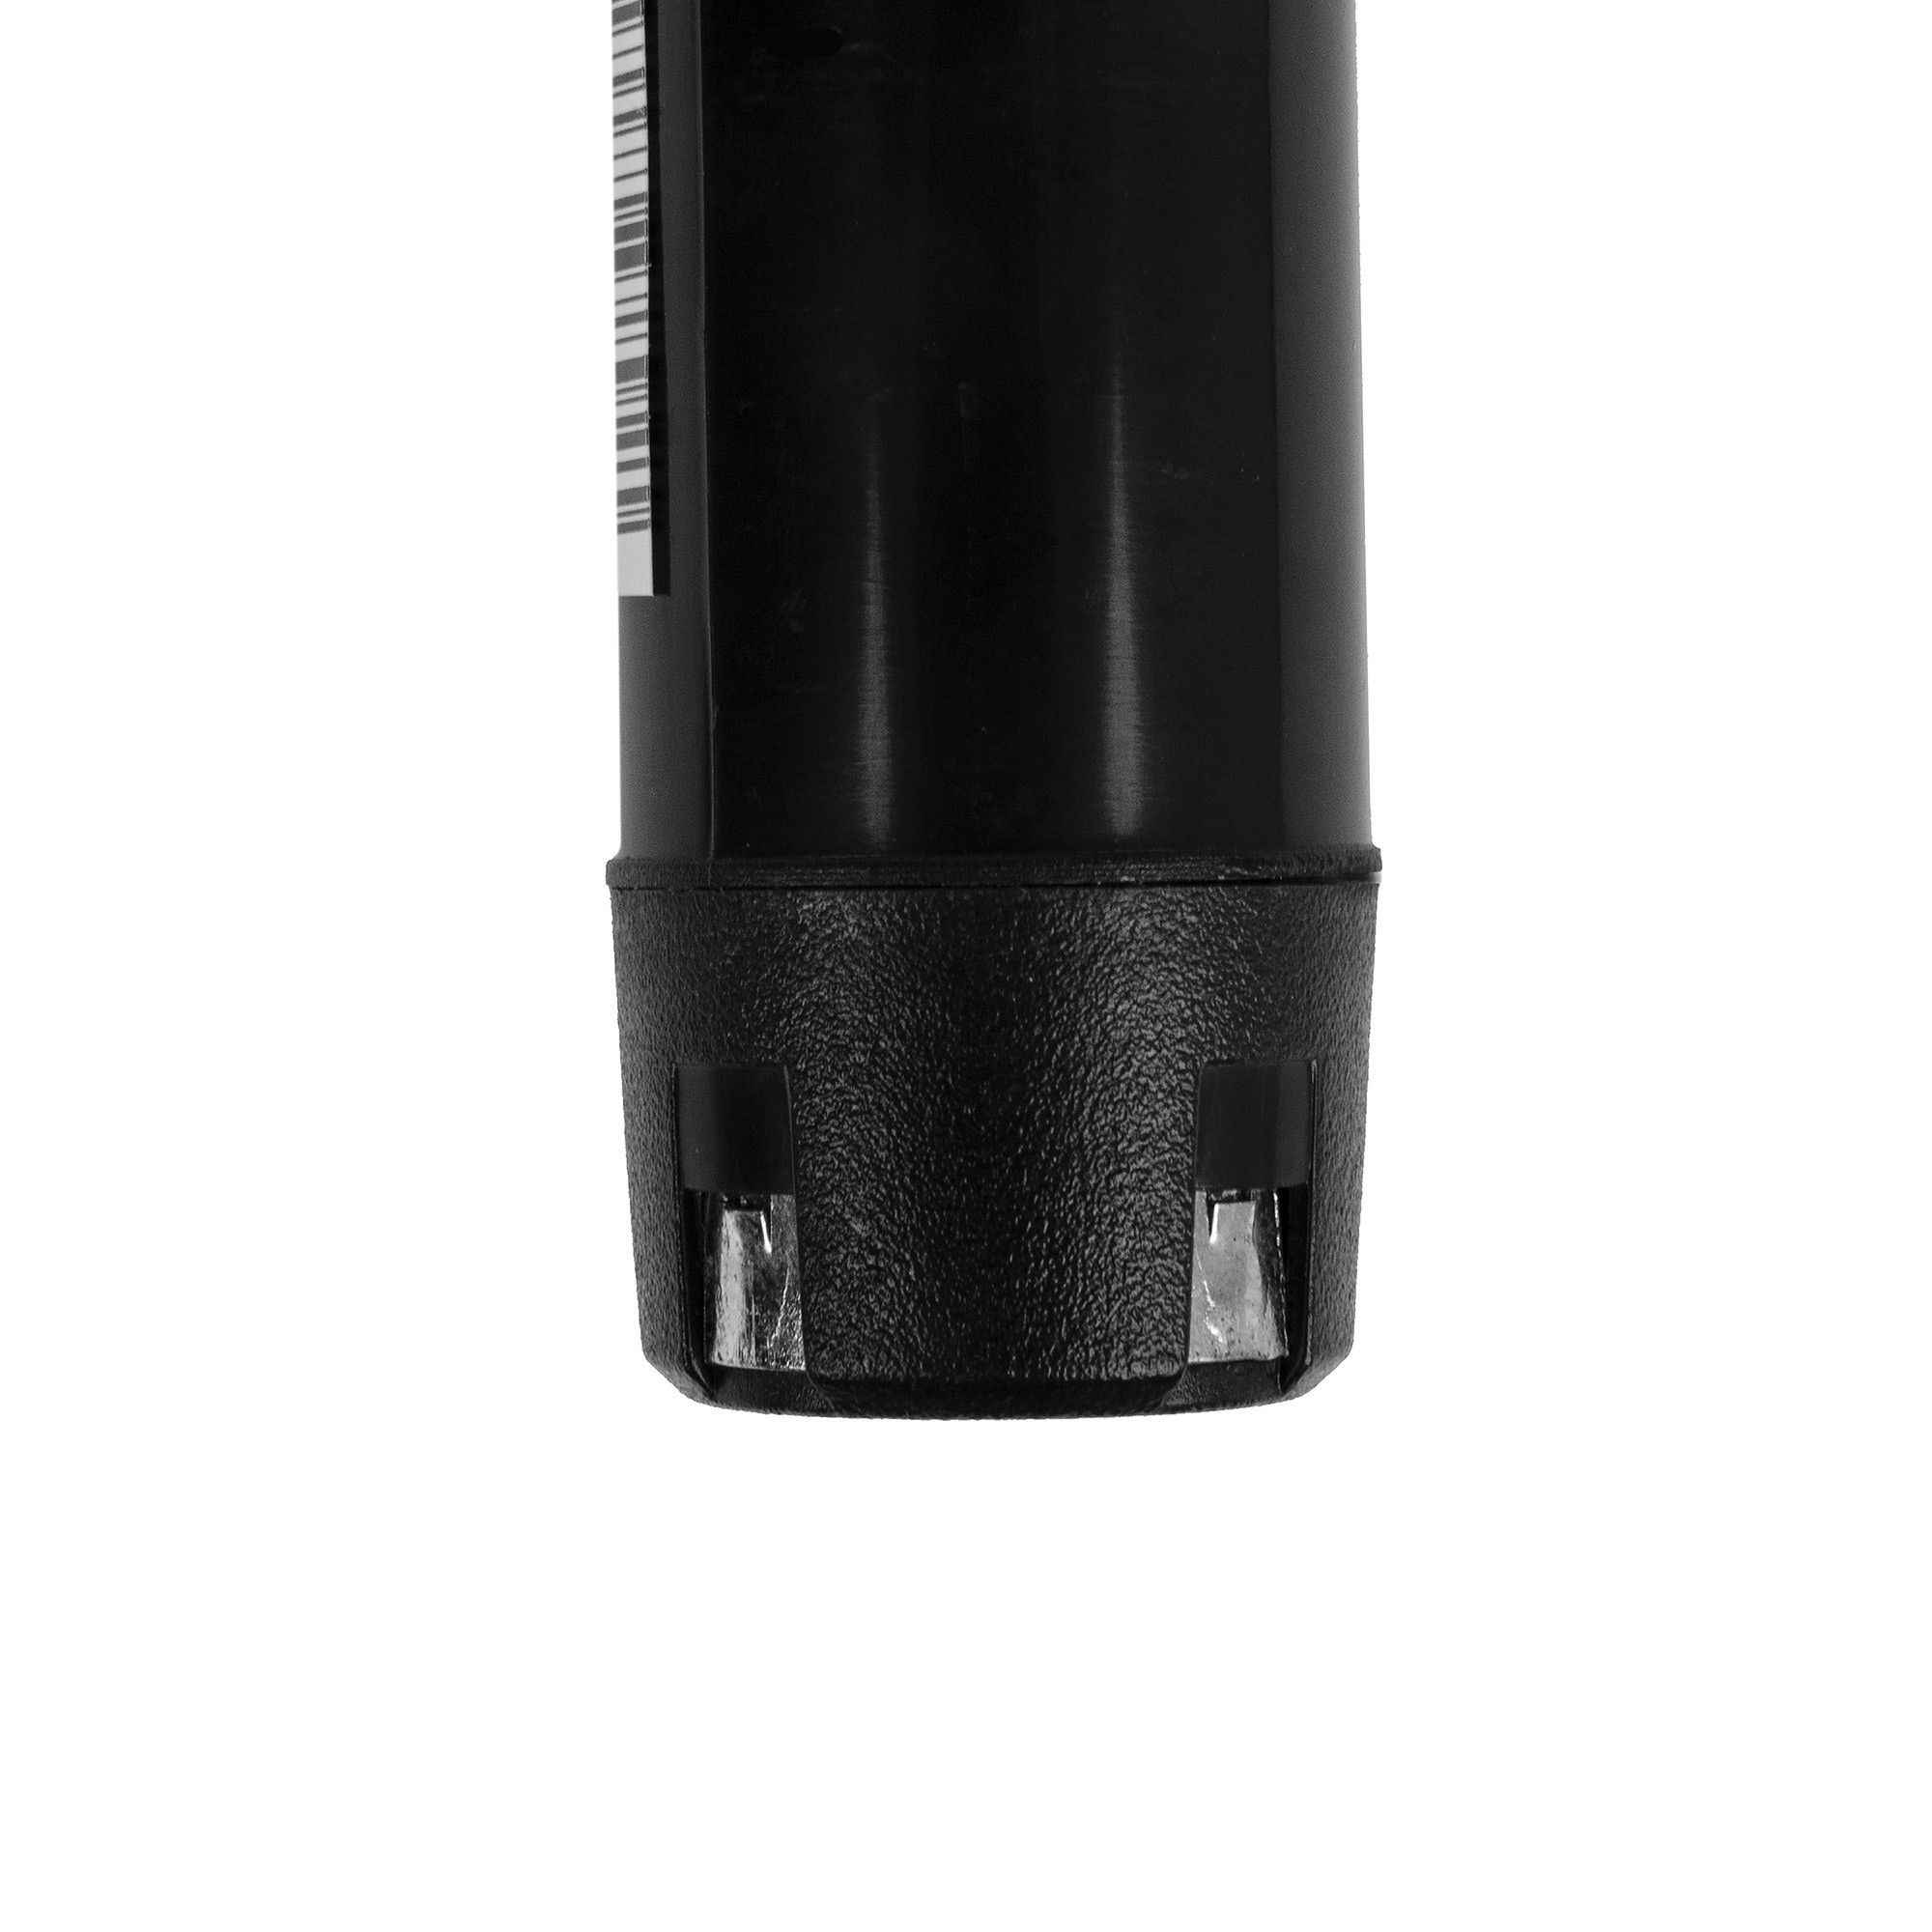 Green Cellverktygsbatteri AP4001 AP4003 för Ryobi HP53L HP54L RP4000 RP4010 RP4020 RP4030 RP4401